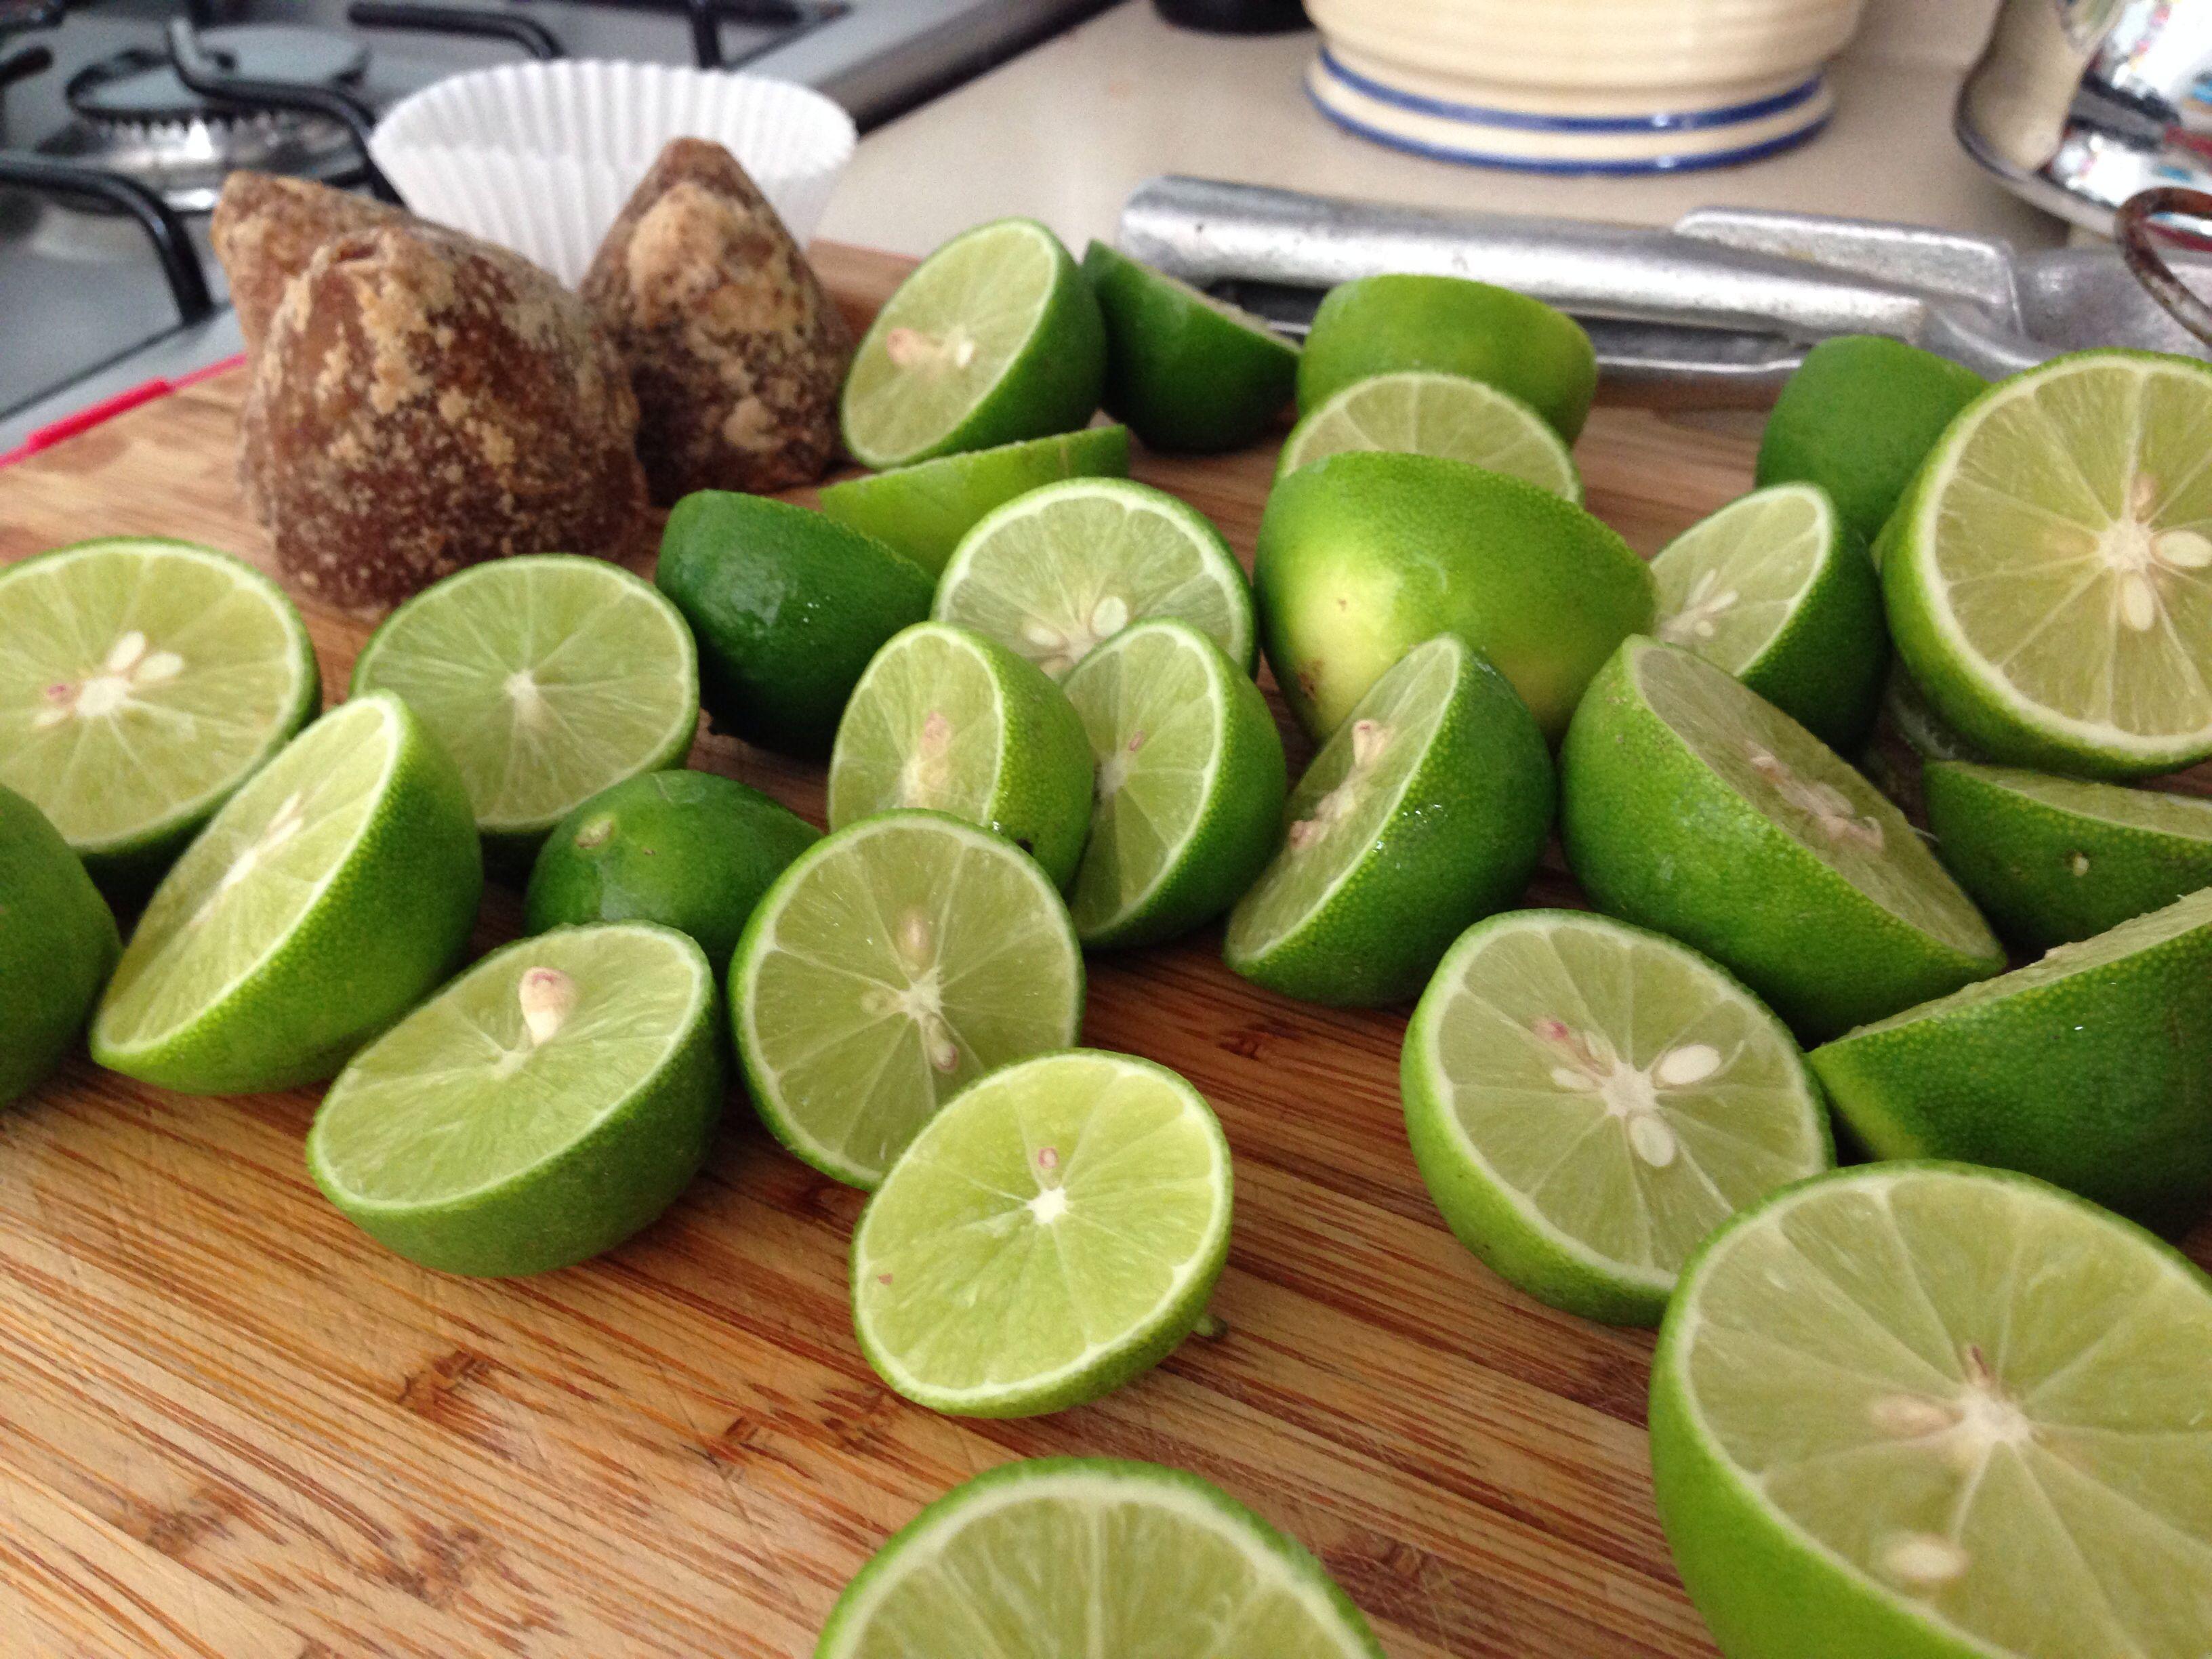 Mastercleanse lemons loosing